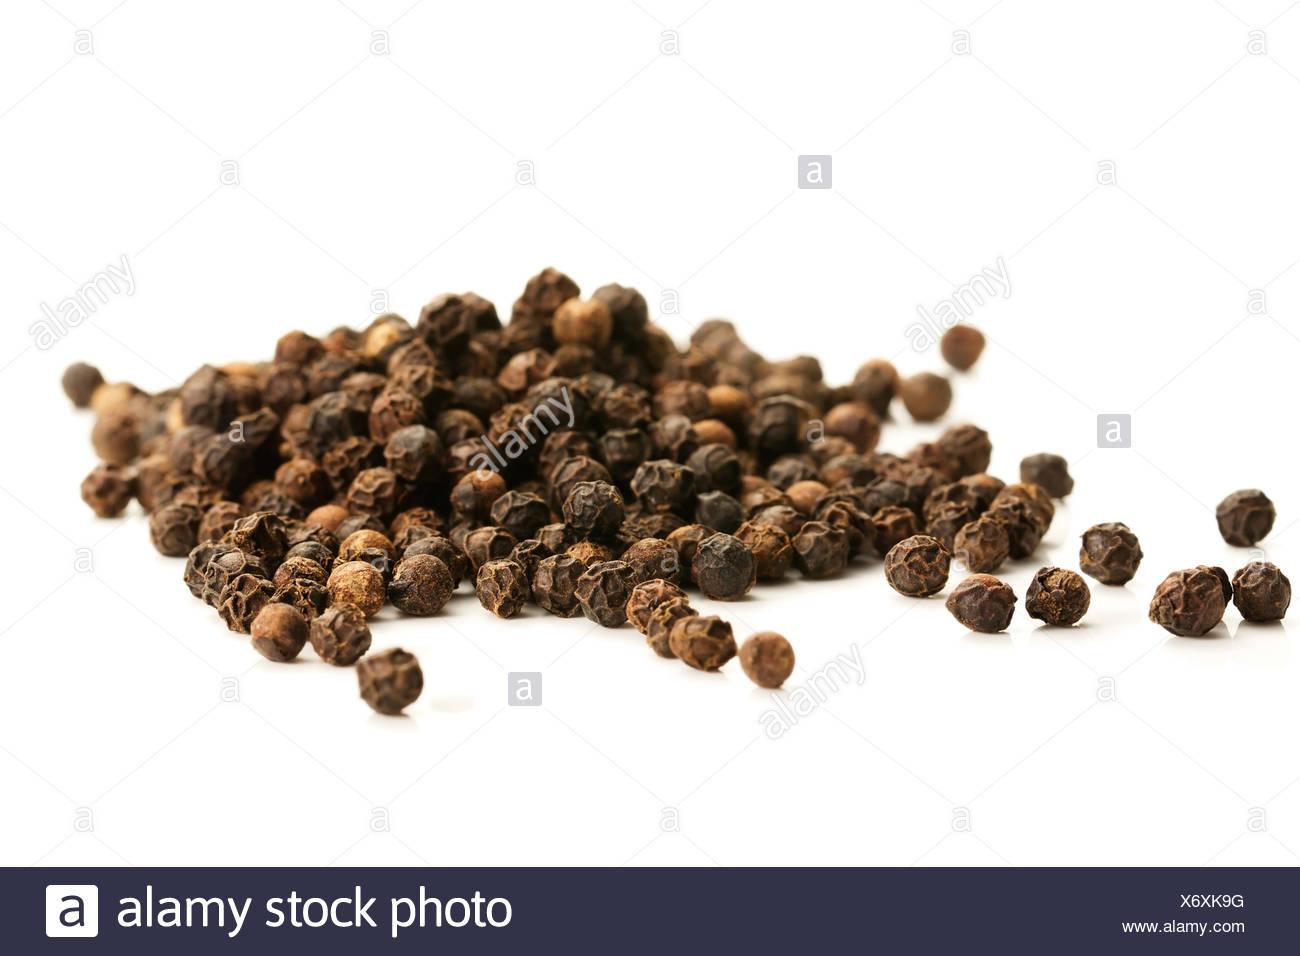 black peppercorns with wooden scoop - Stock Image